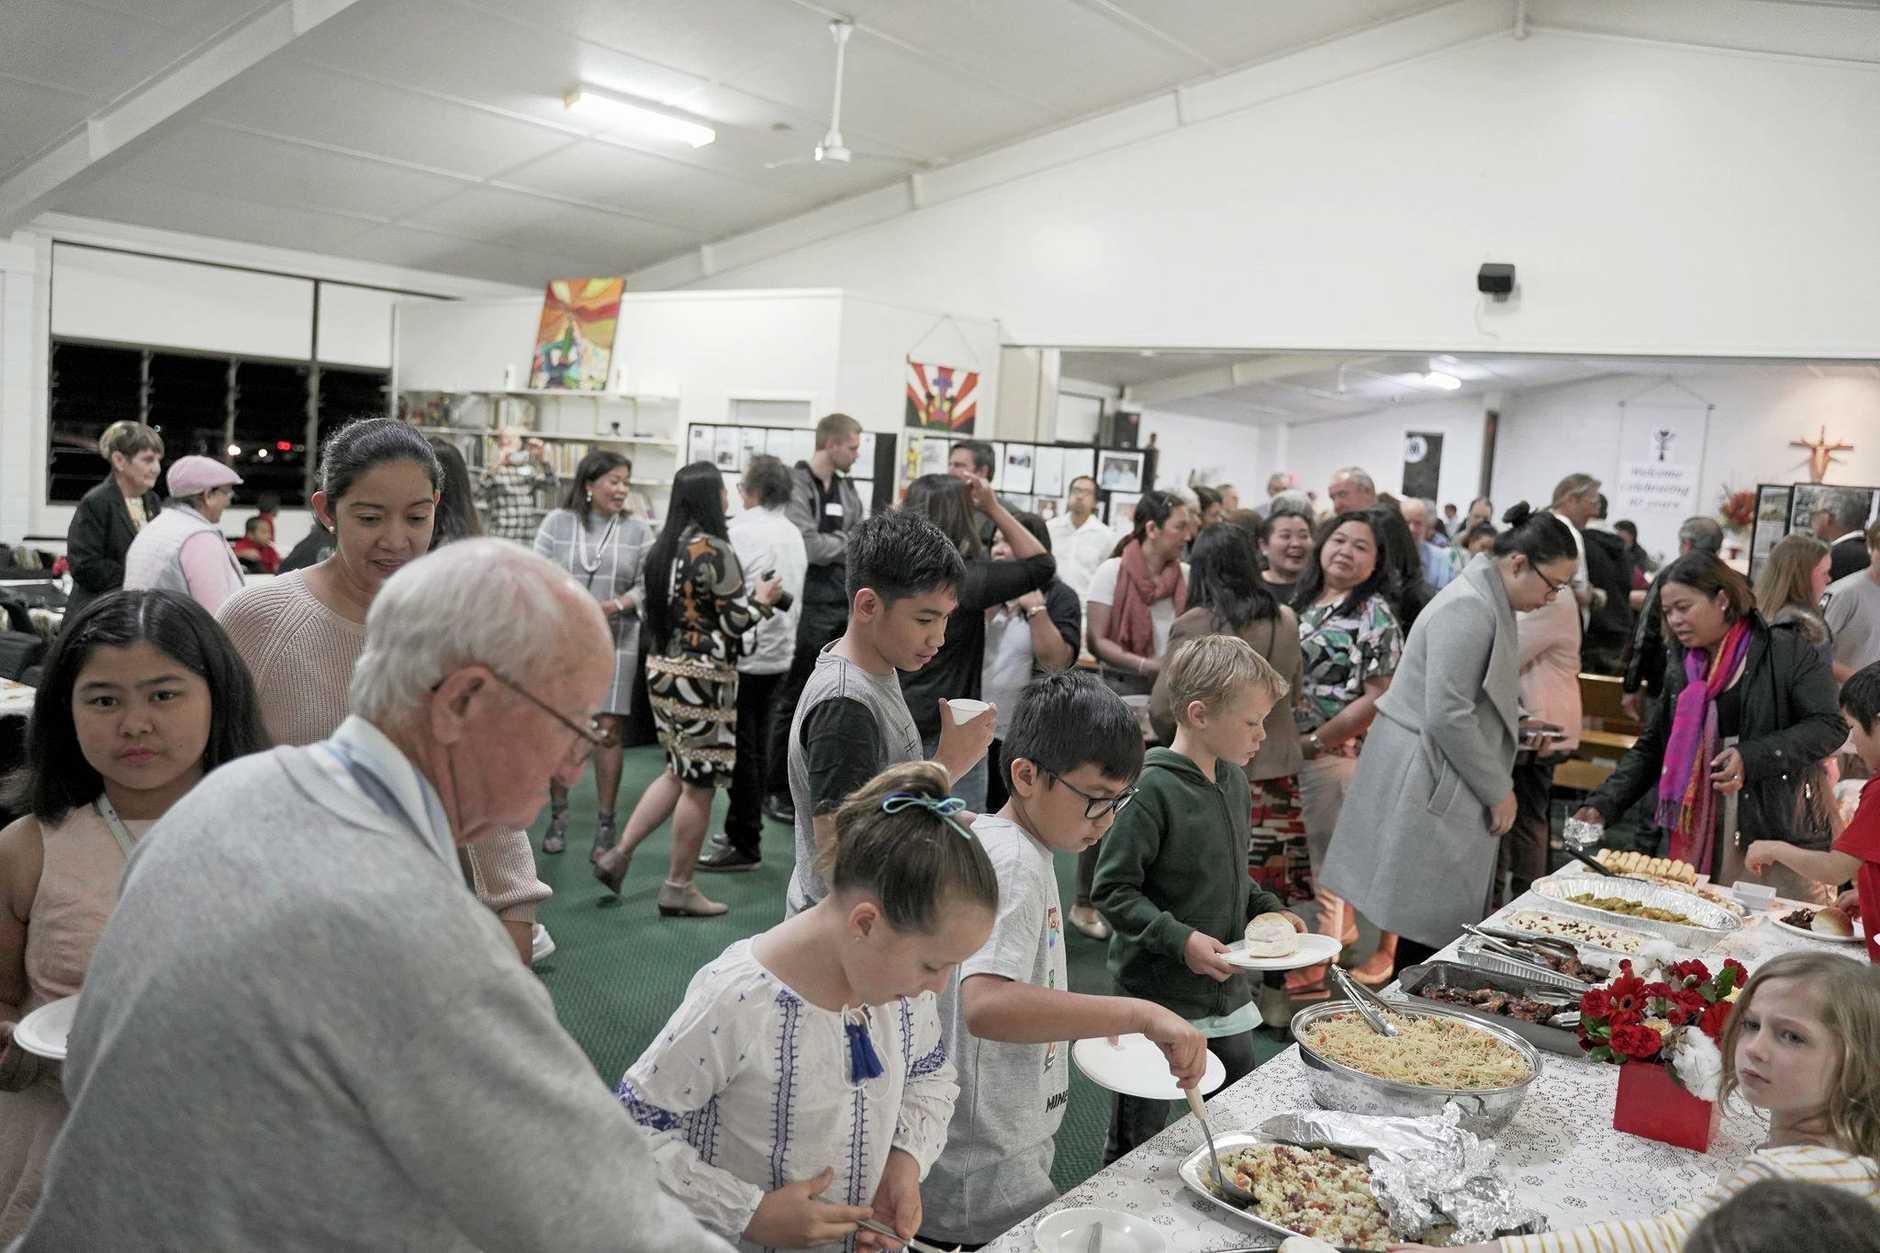 40 UP: Good food and good company at St Joseph's Moranbah's 40th anniversary celebration.